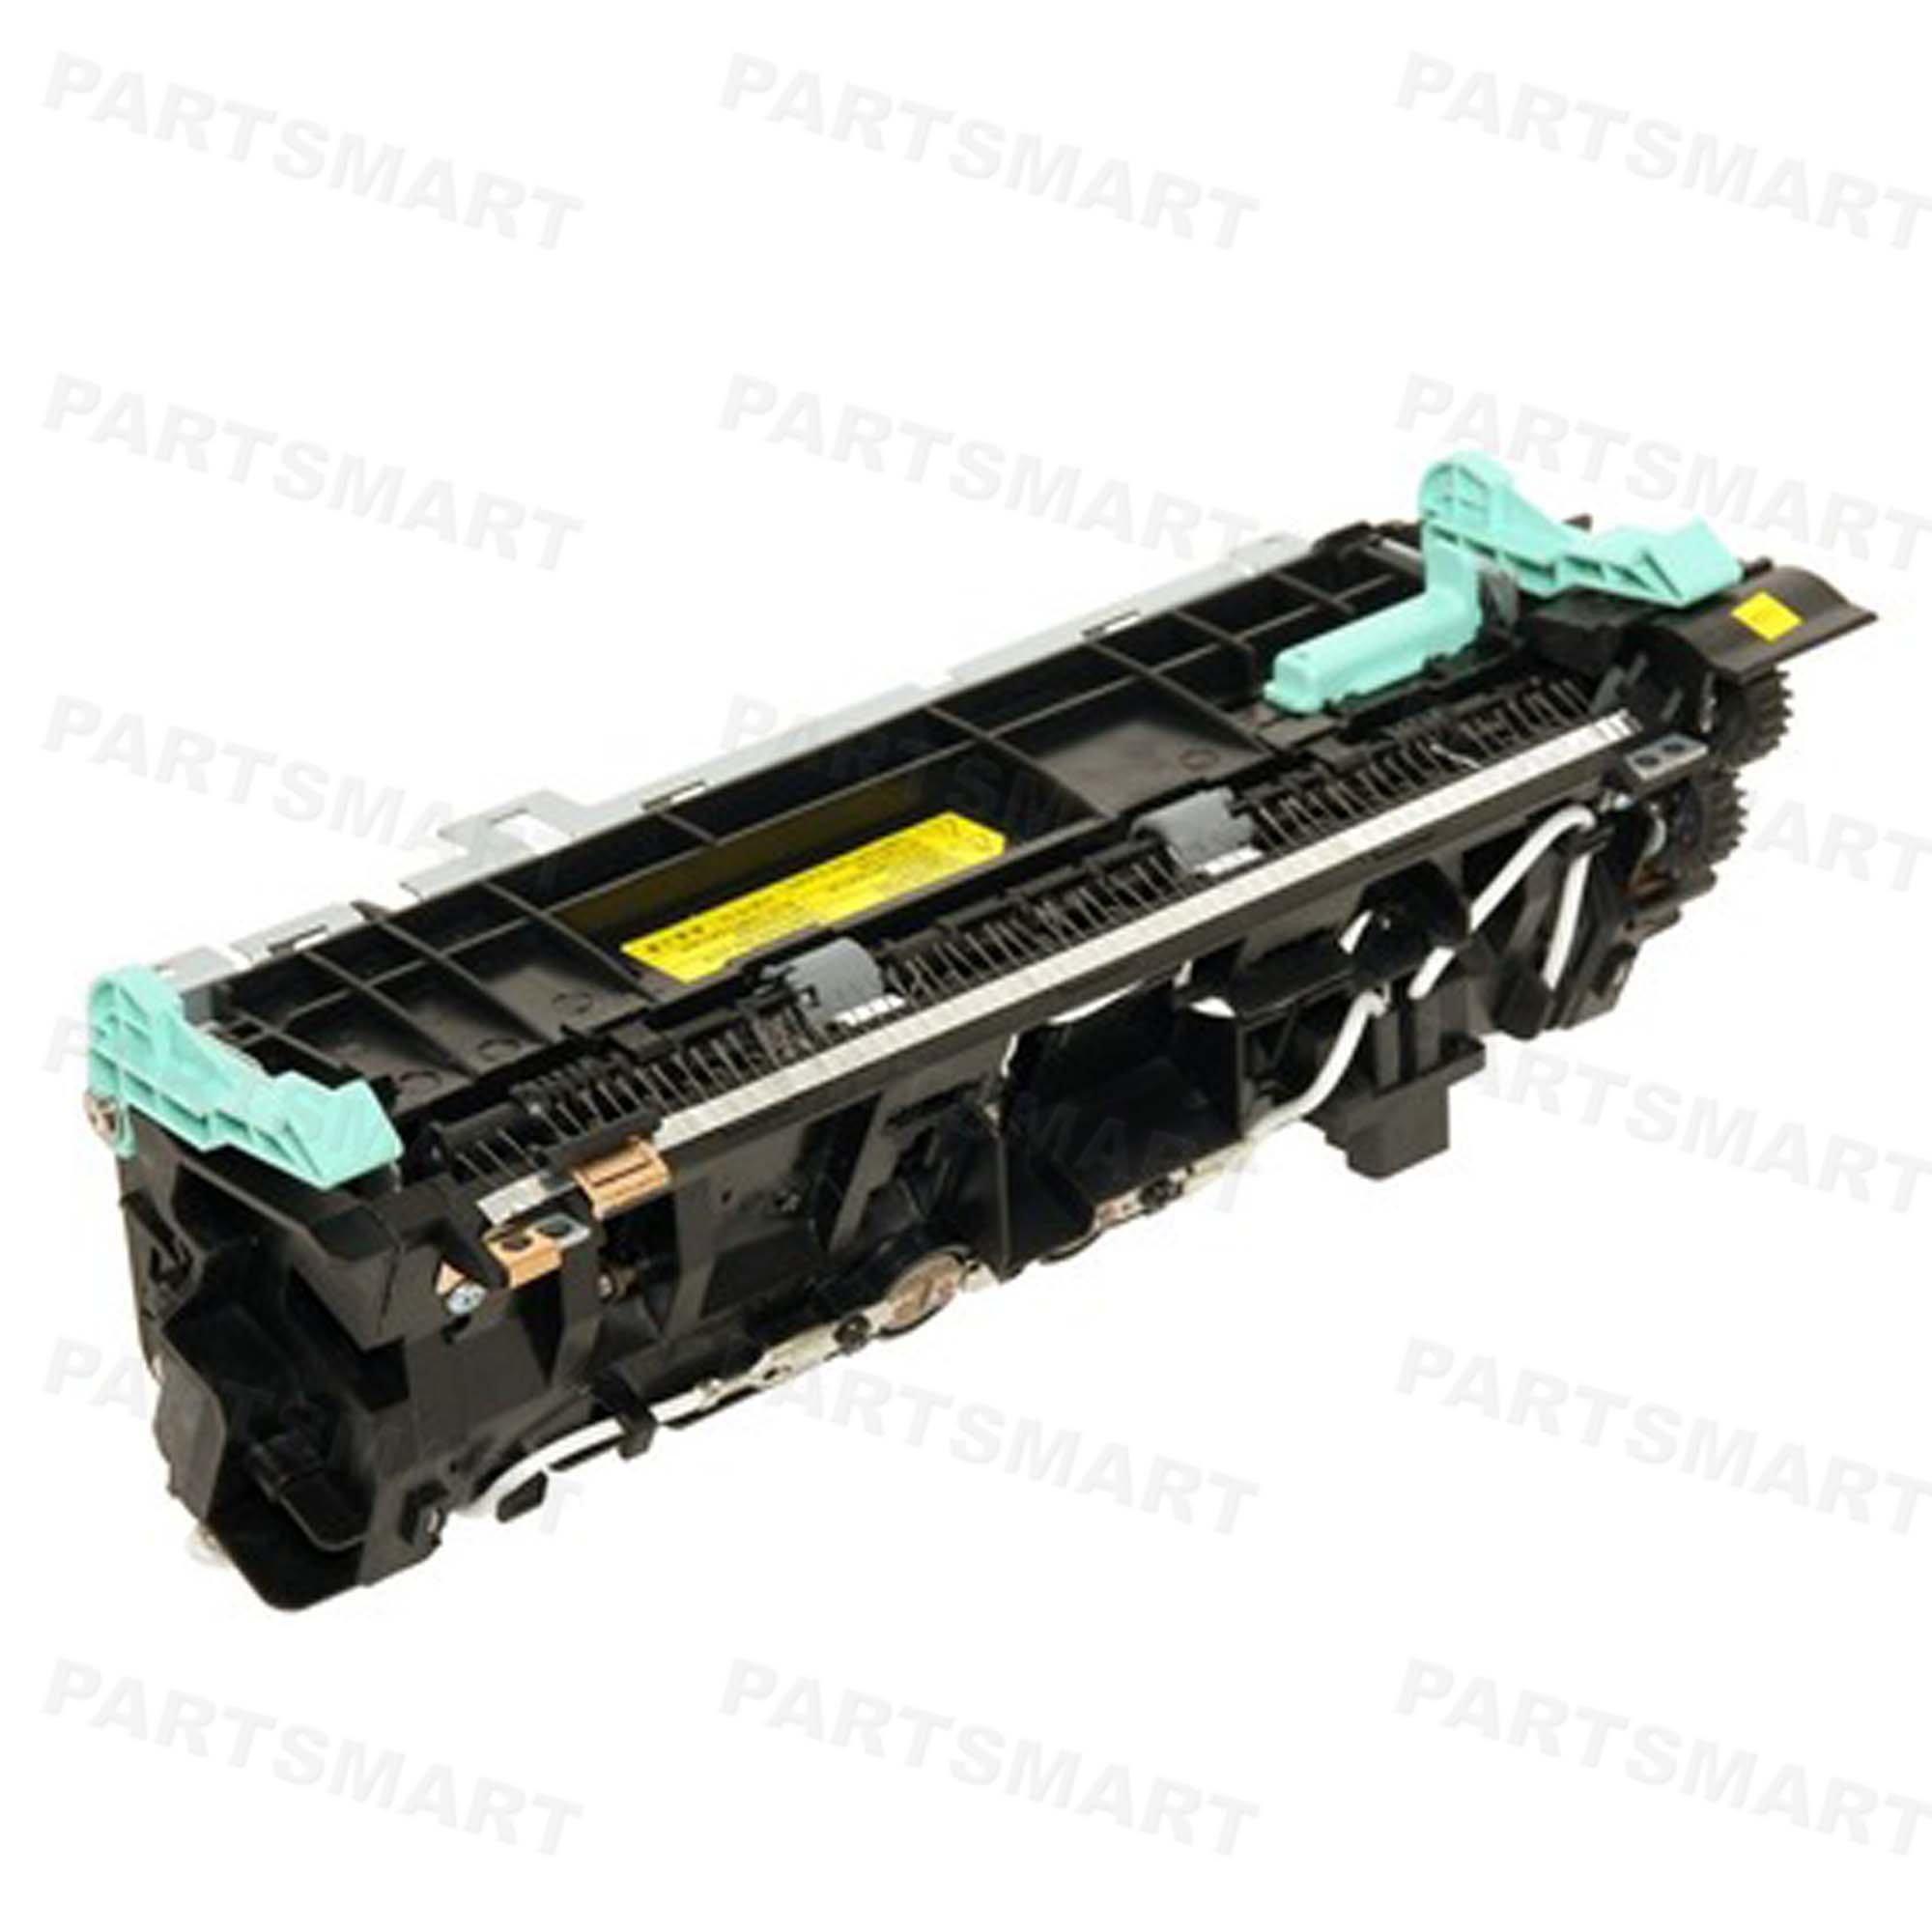 JC91-00925D Fuser Assembly (110V) Samsung SCX-5835FN